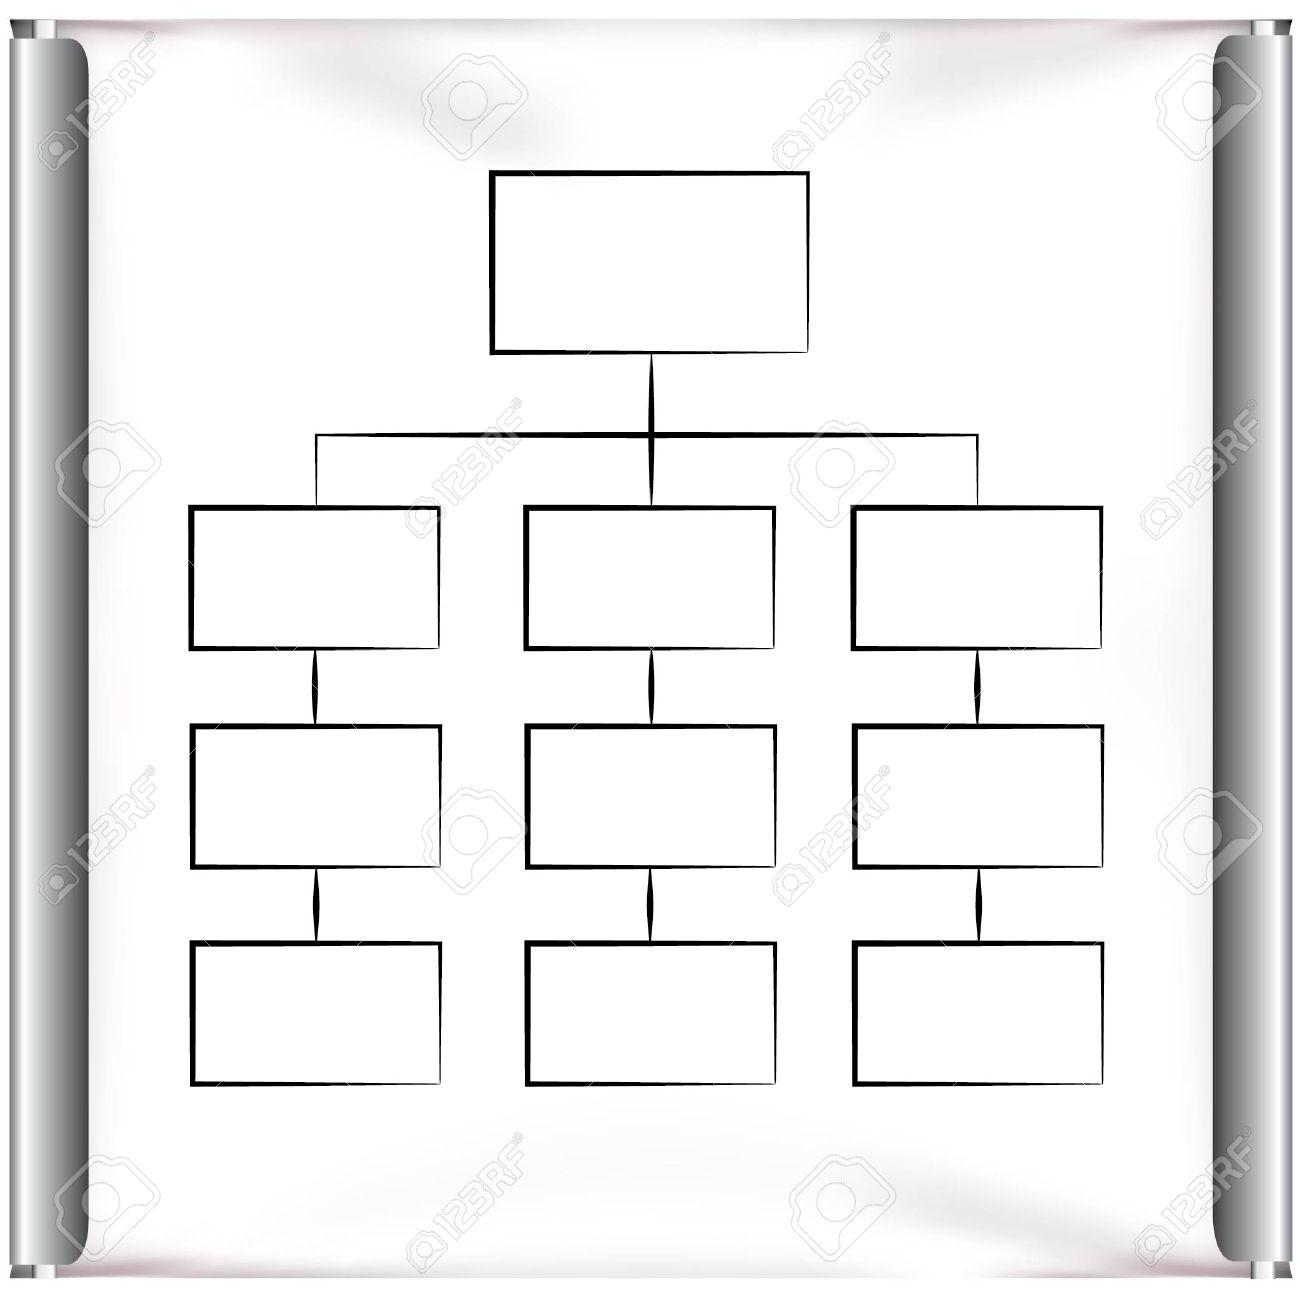 Fantastisch Projektor Diagramm Fotos - Der Schaltplan - greigo.com